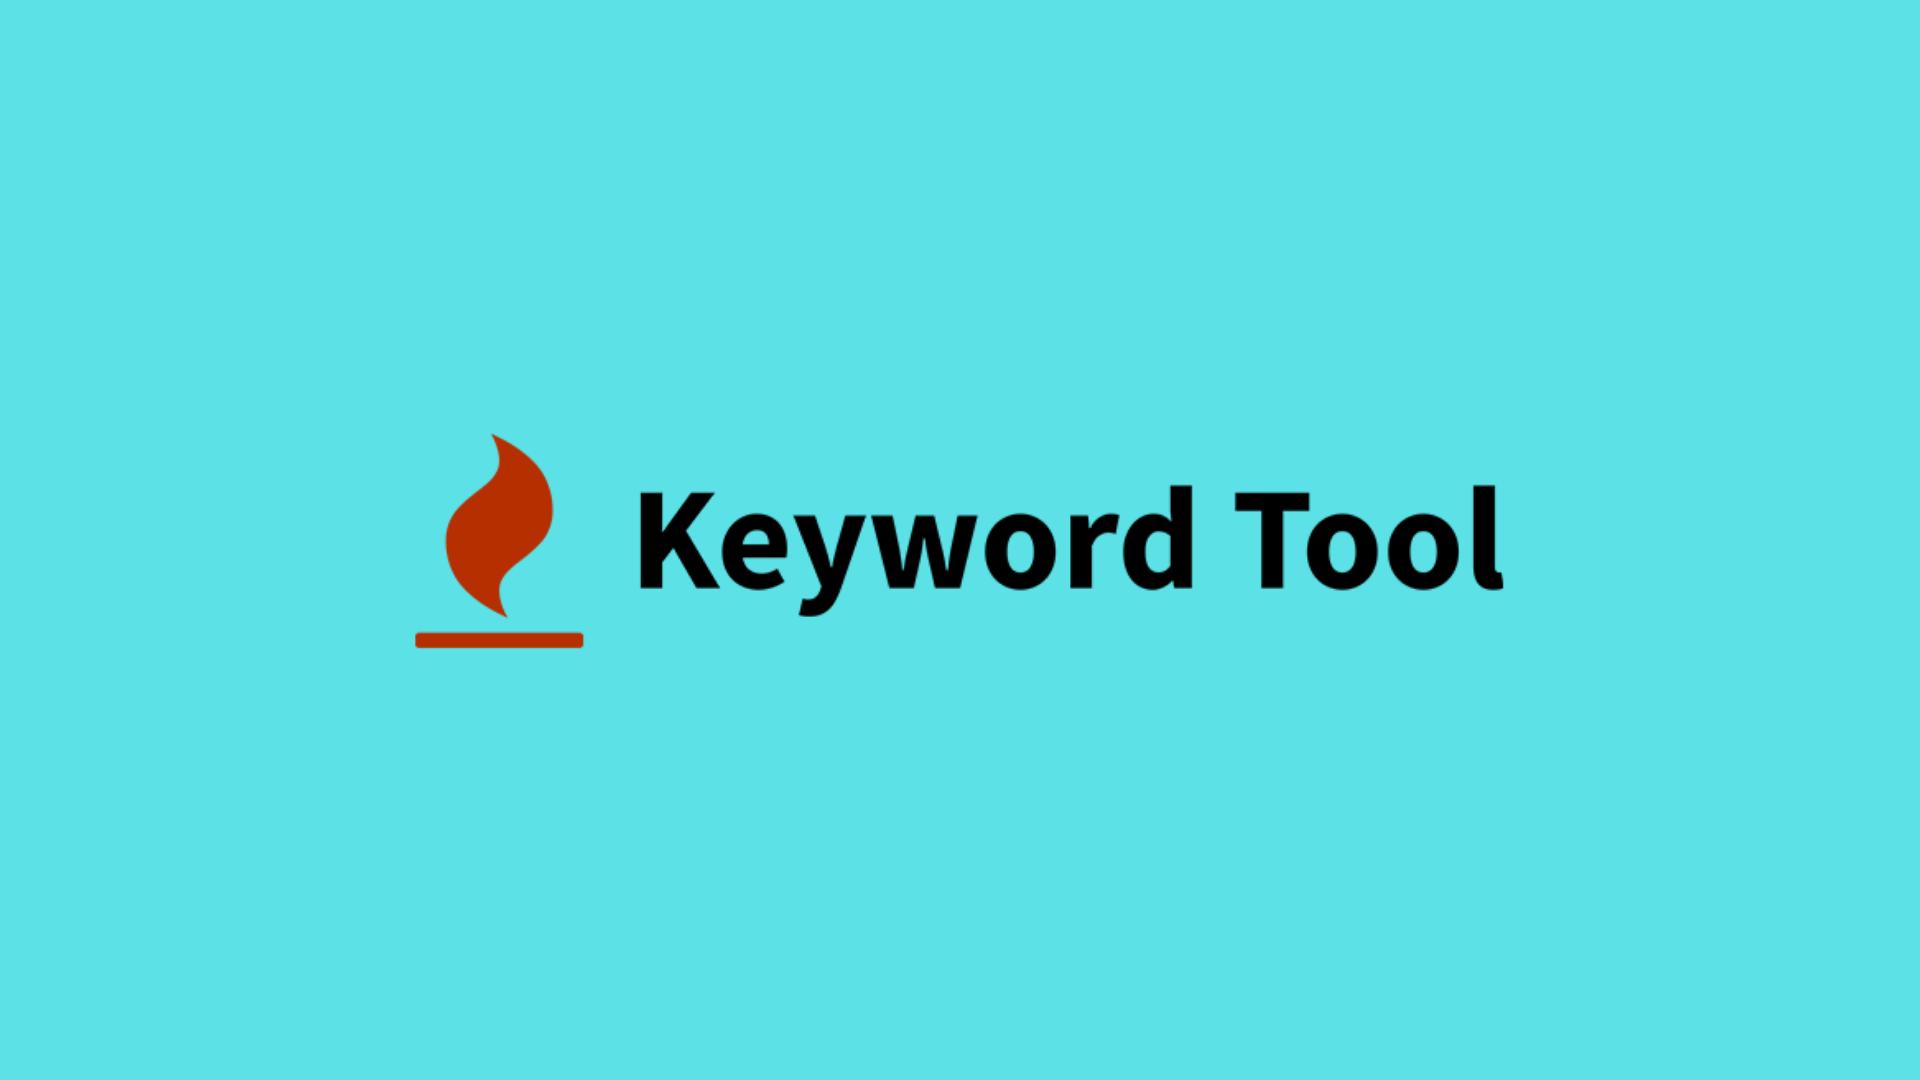 How does Keyword Tool work?